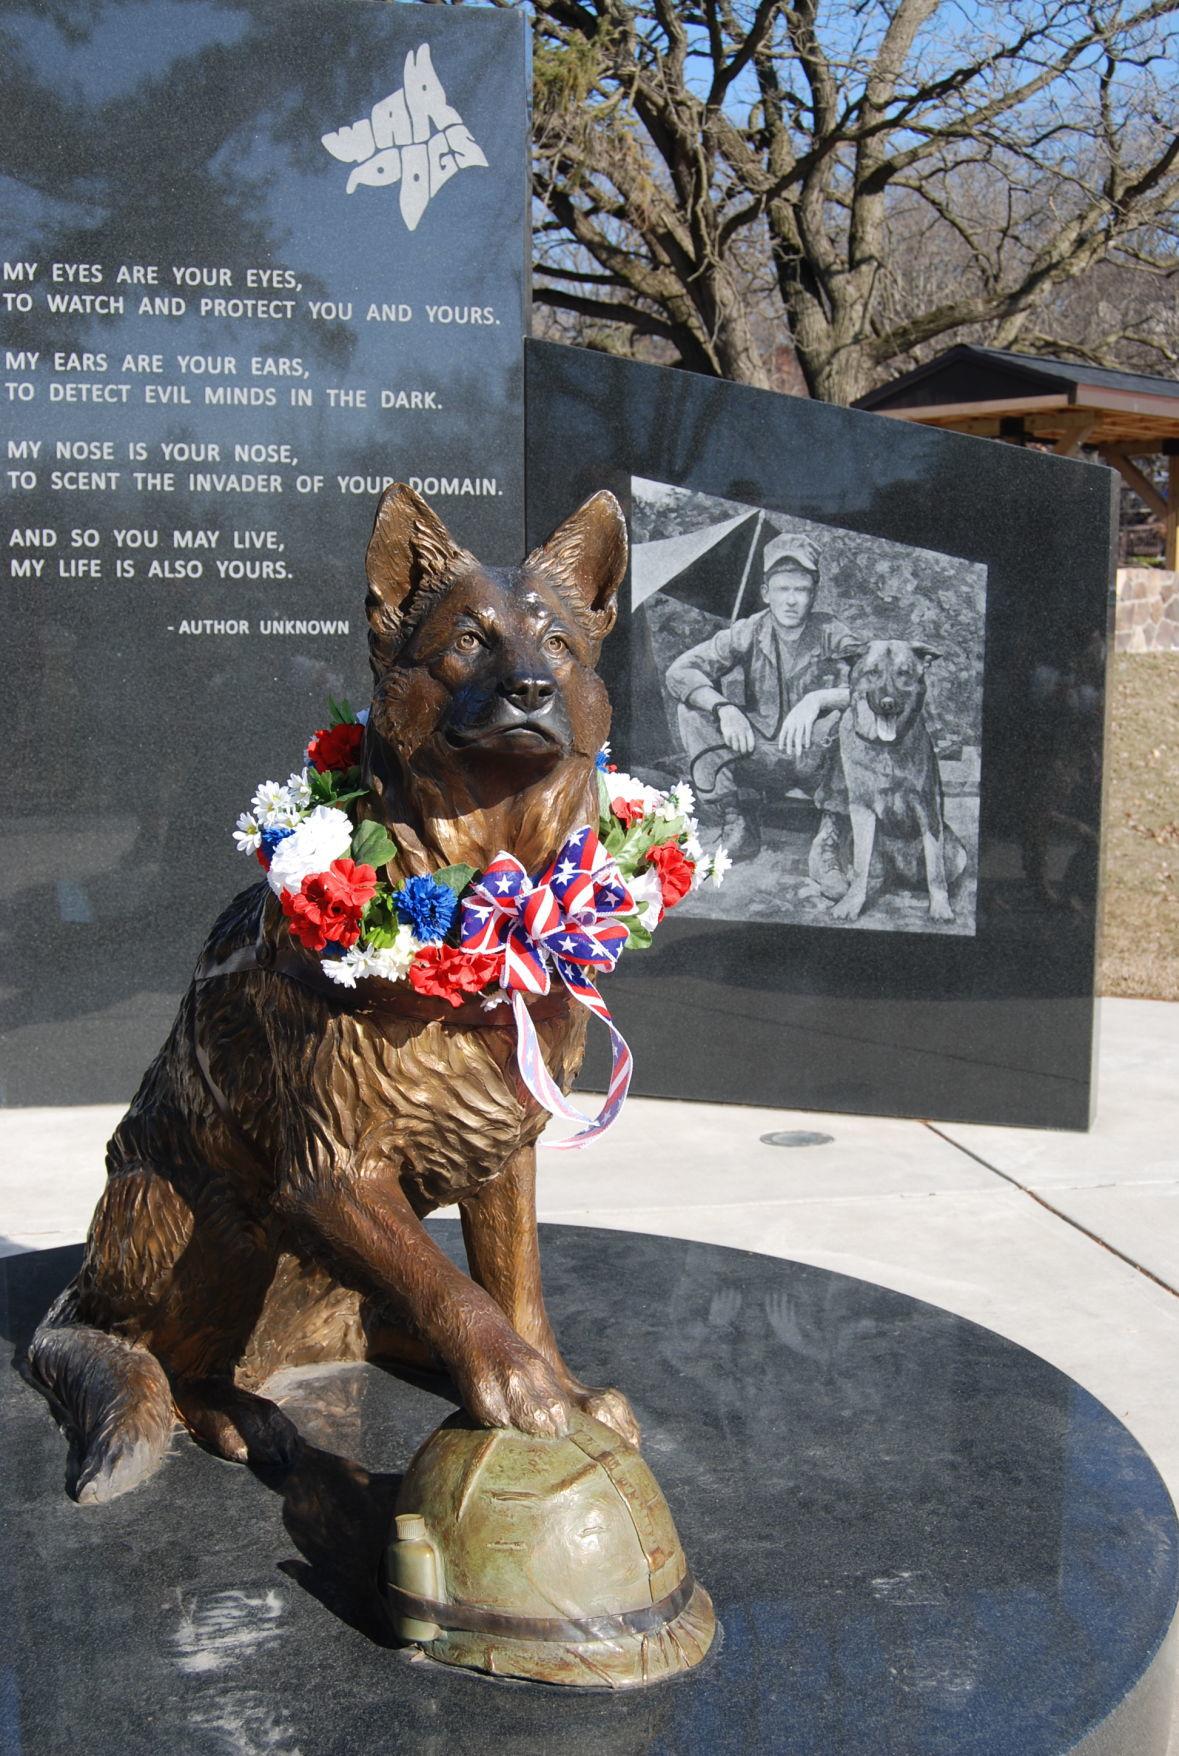 Wreath of honor